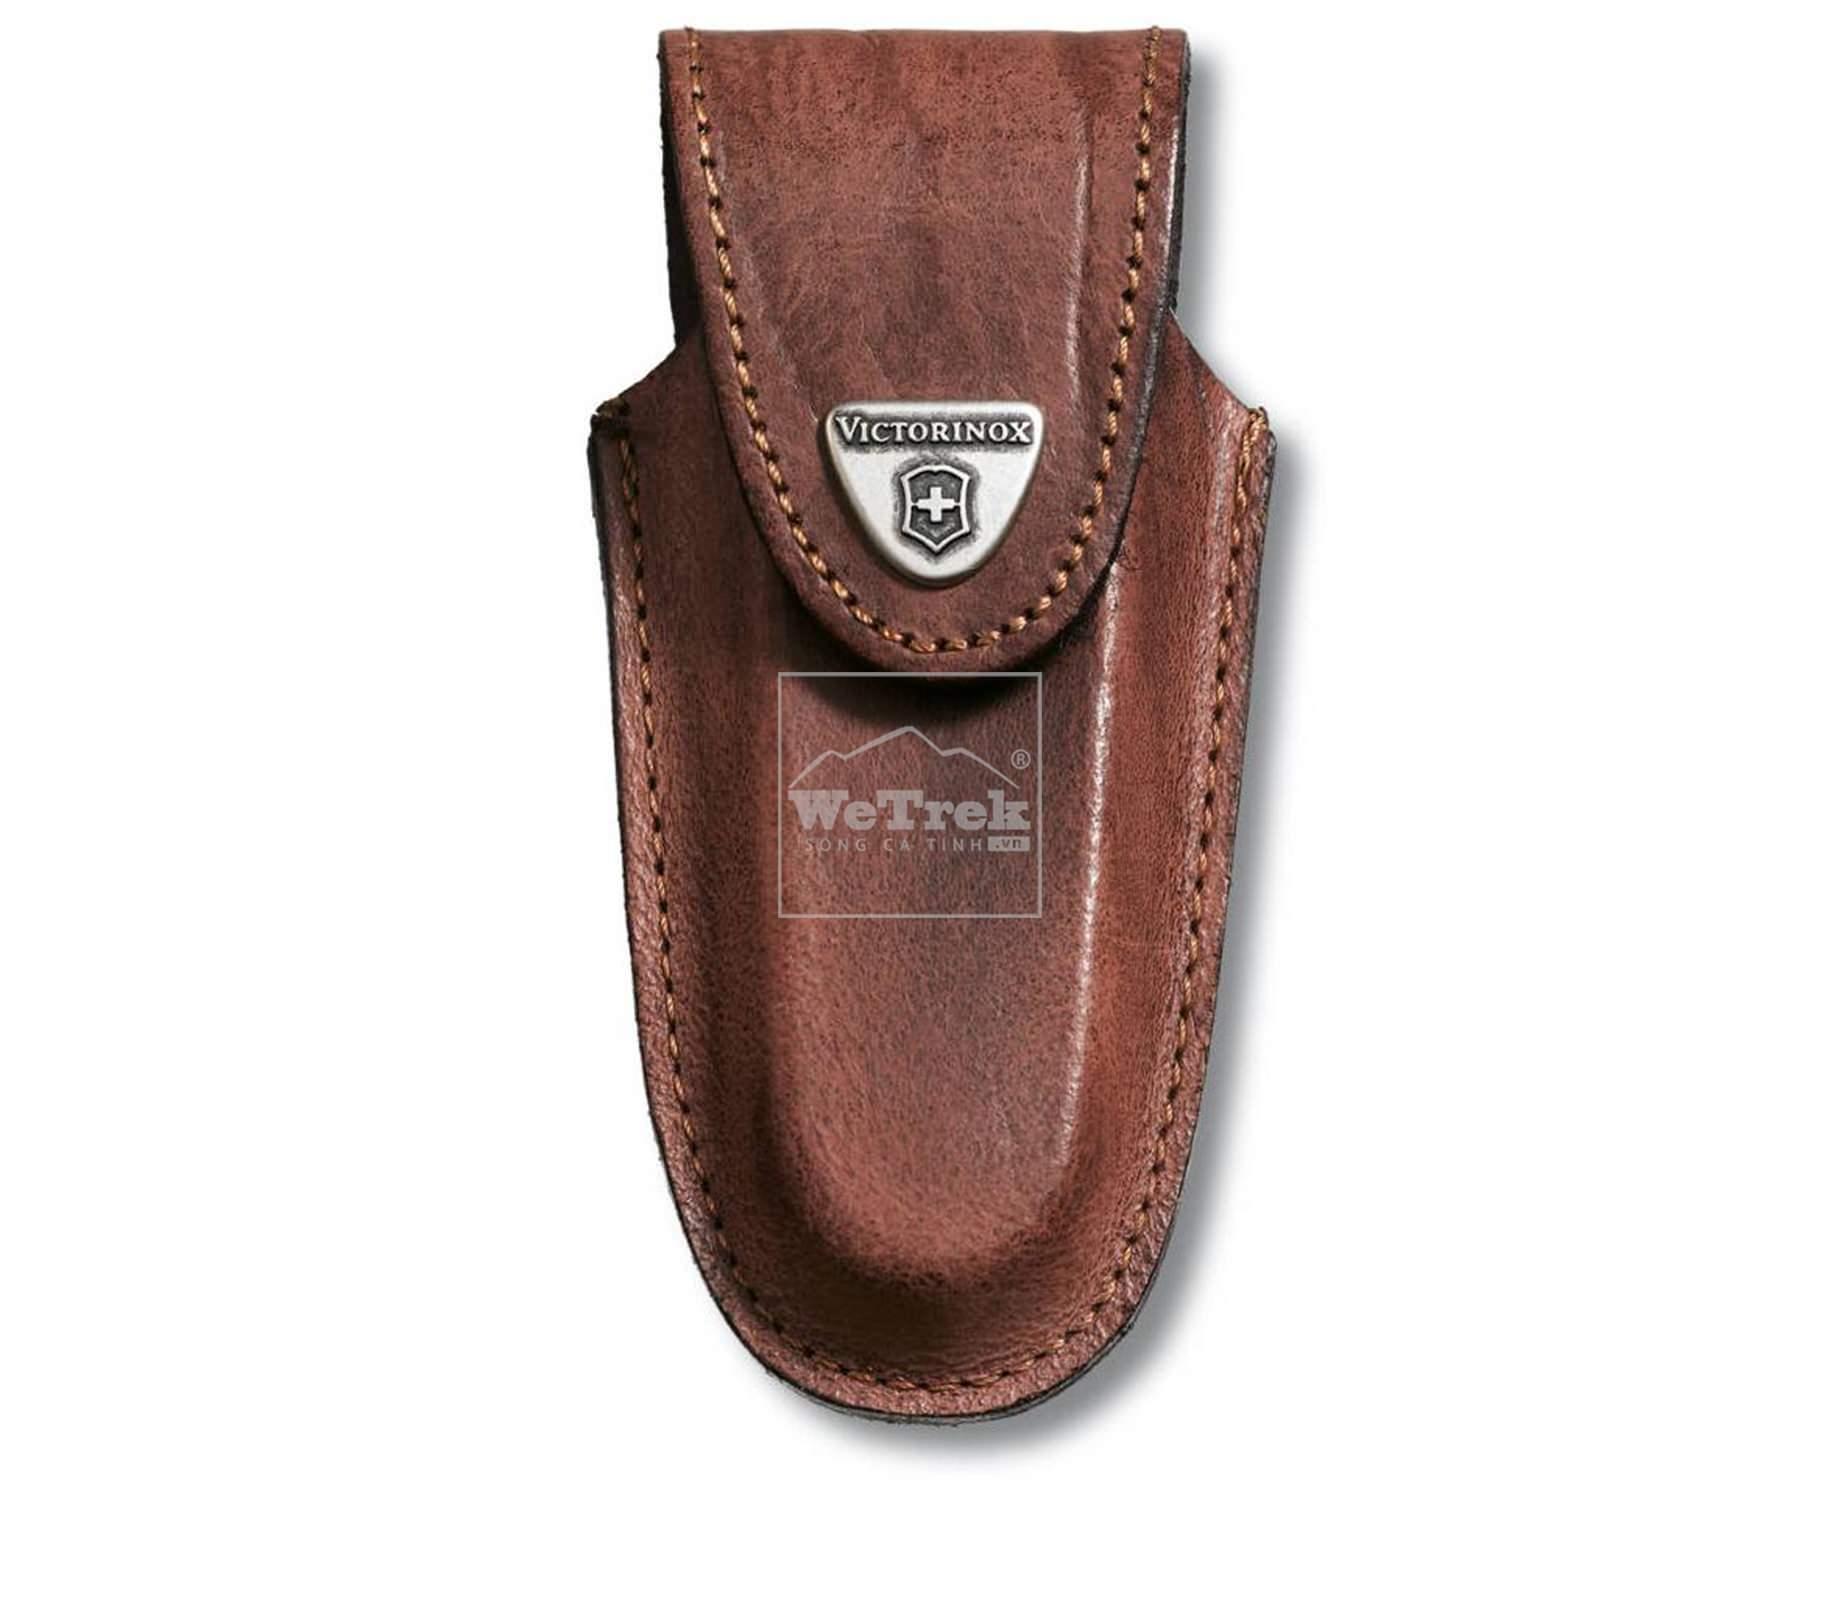 Bao đeo thắt lưng VICTORINOX Belt Pouch 4.0537 - 7141